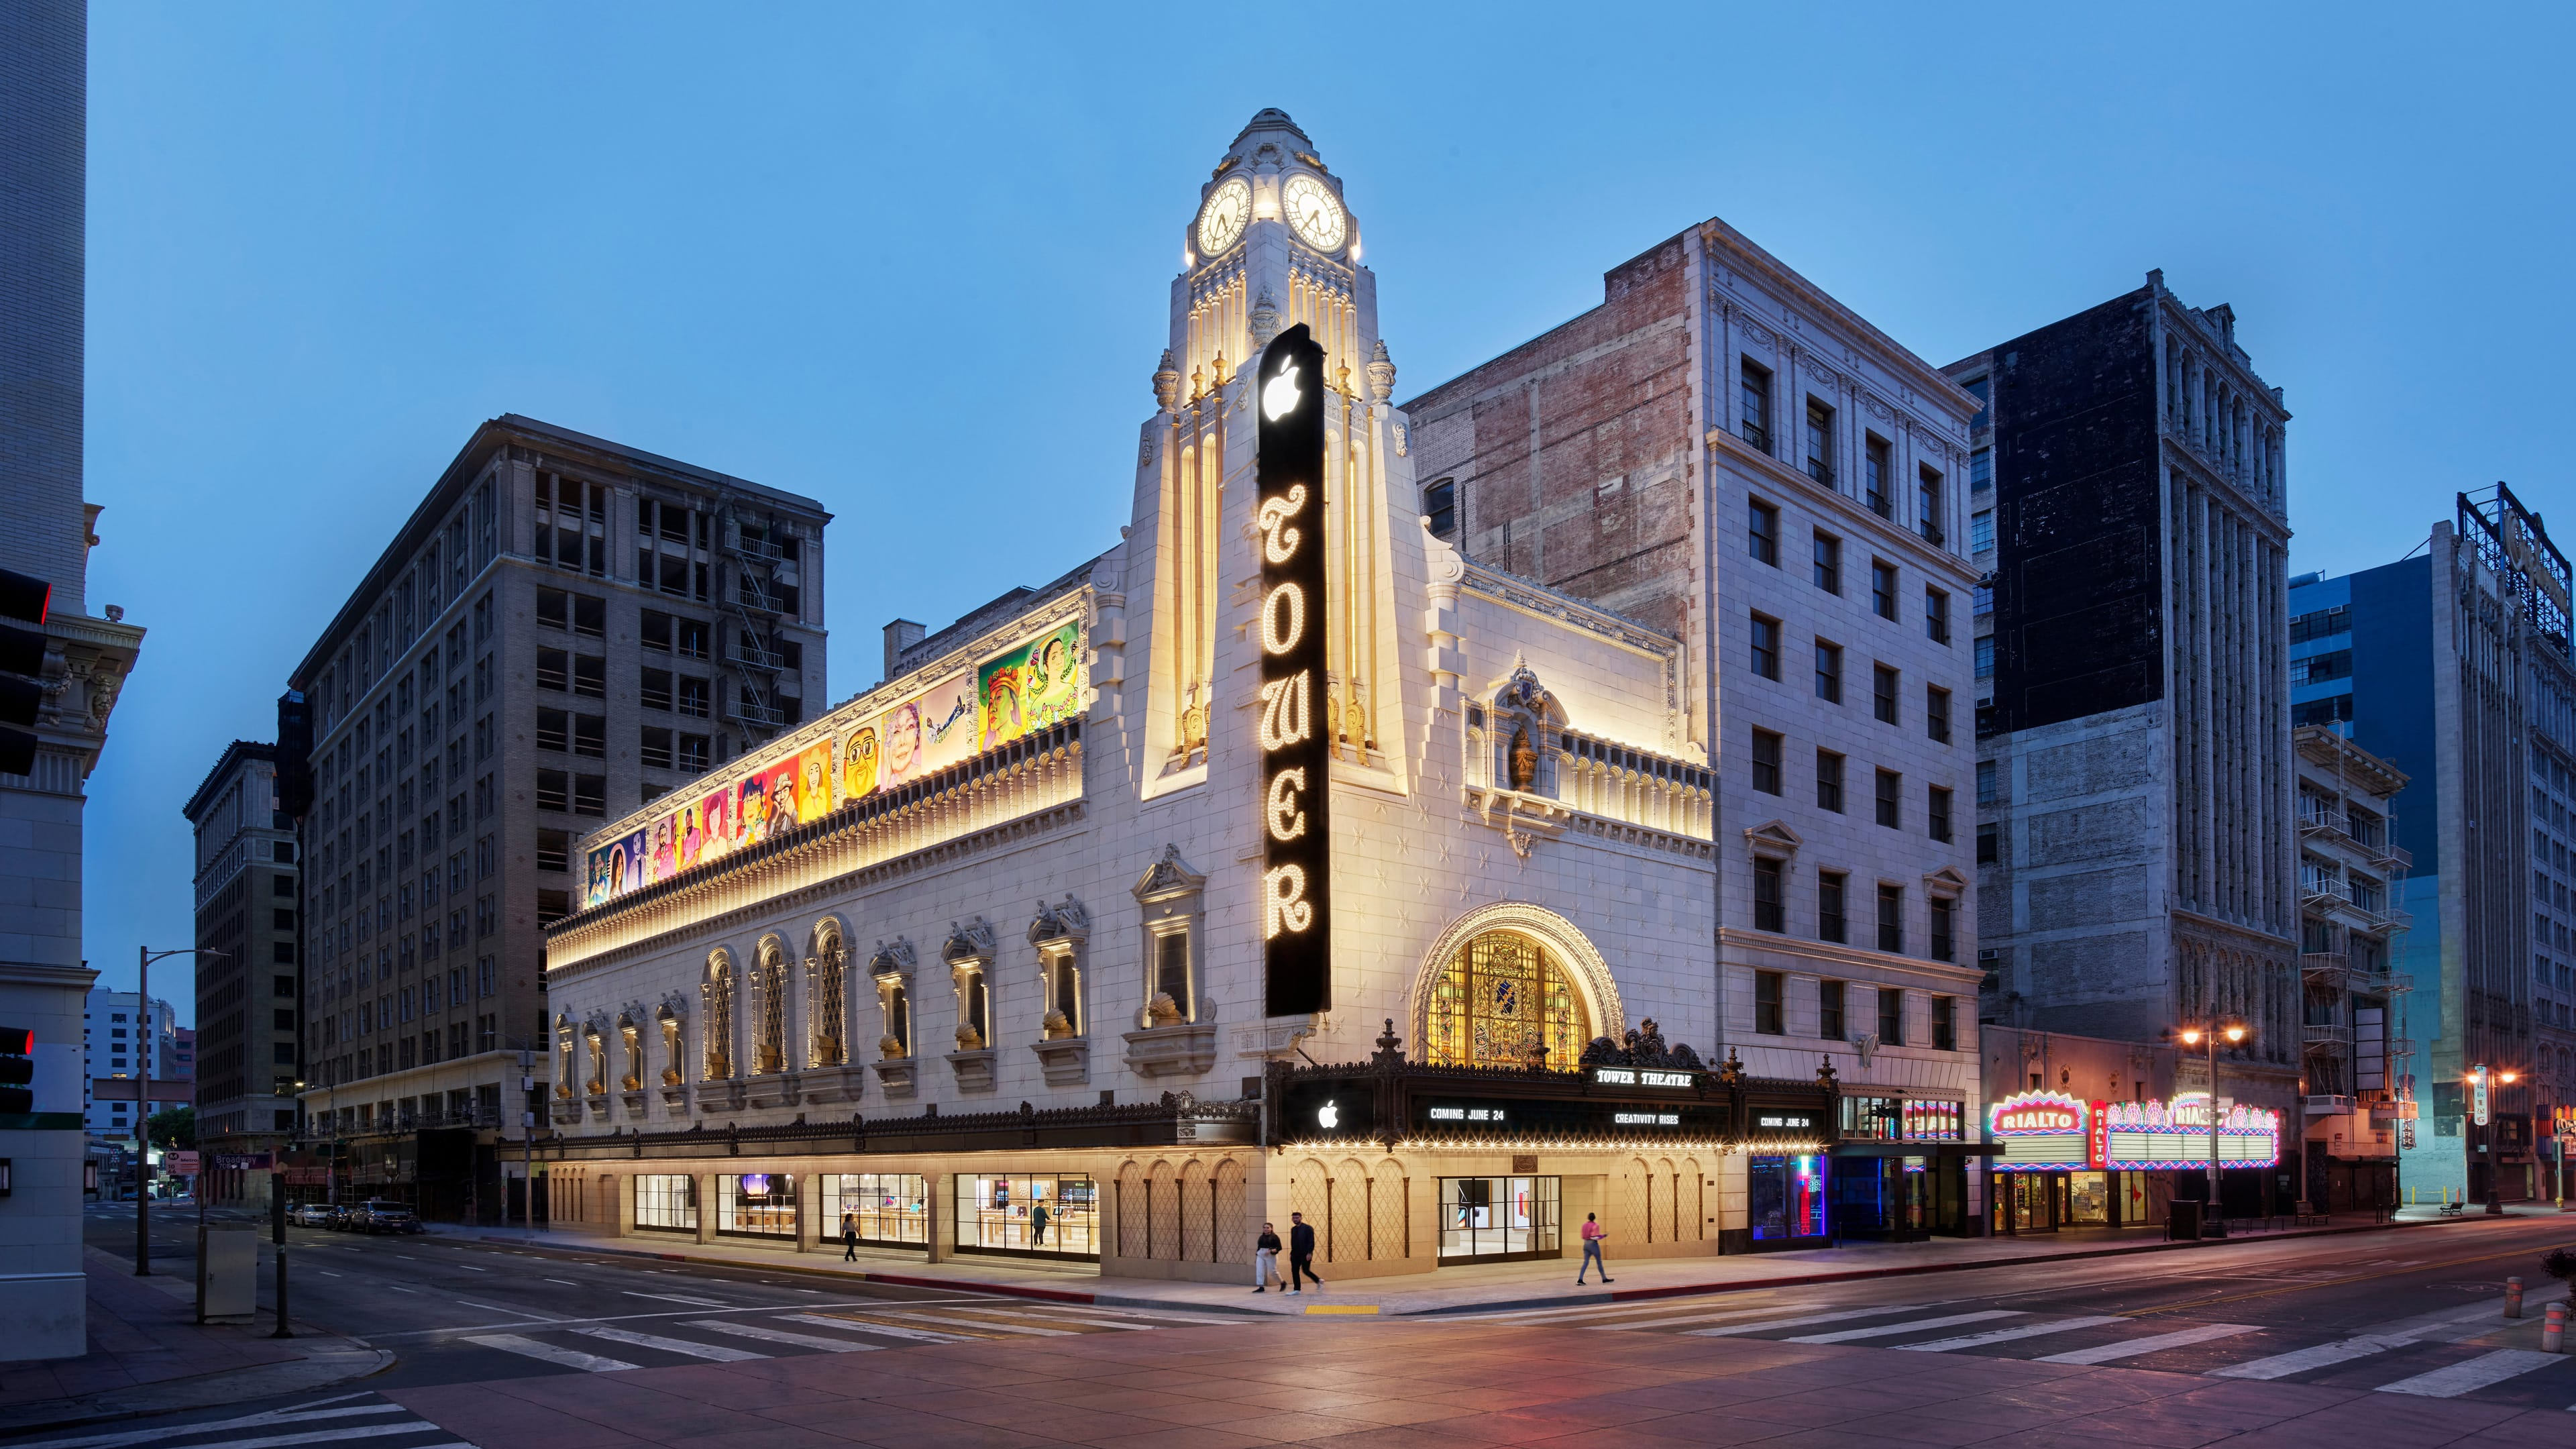 Apple、ロサンゼルスに新しい直営店「Apple Tower Theatre」をオープン